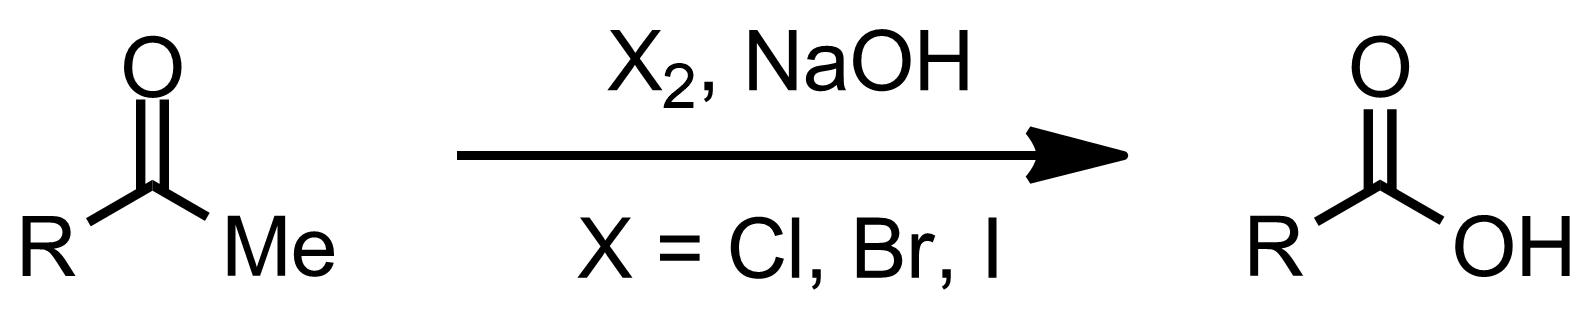 Schematic representation of the Haloform Reaction.